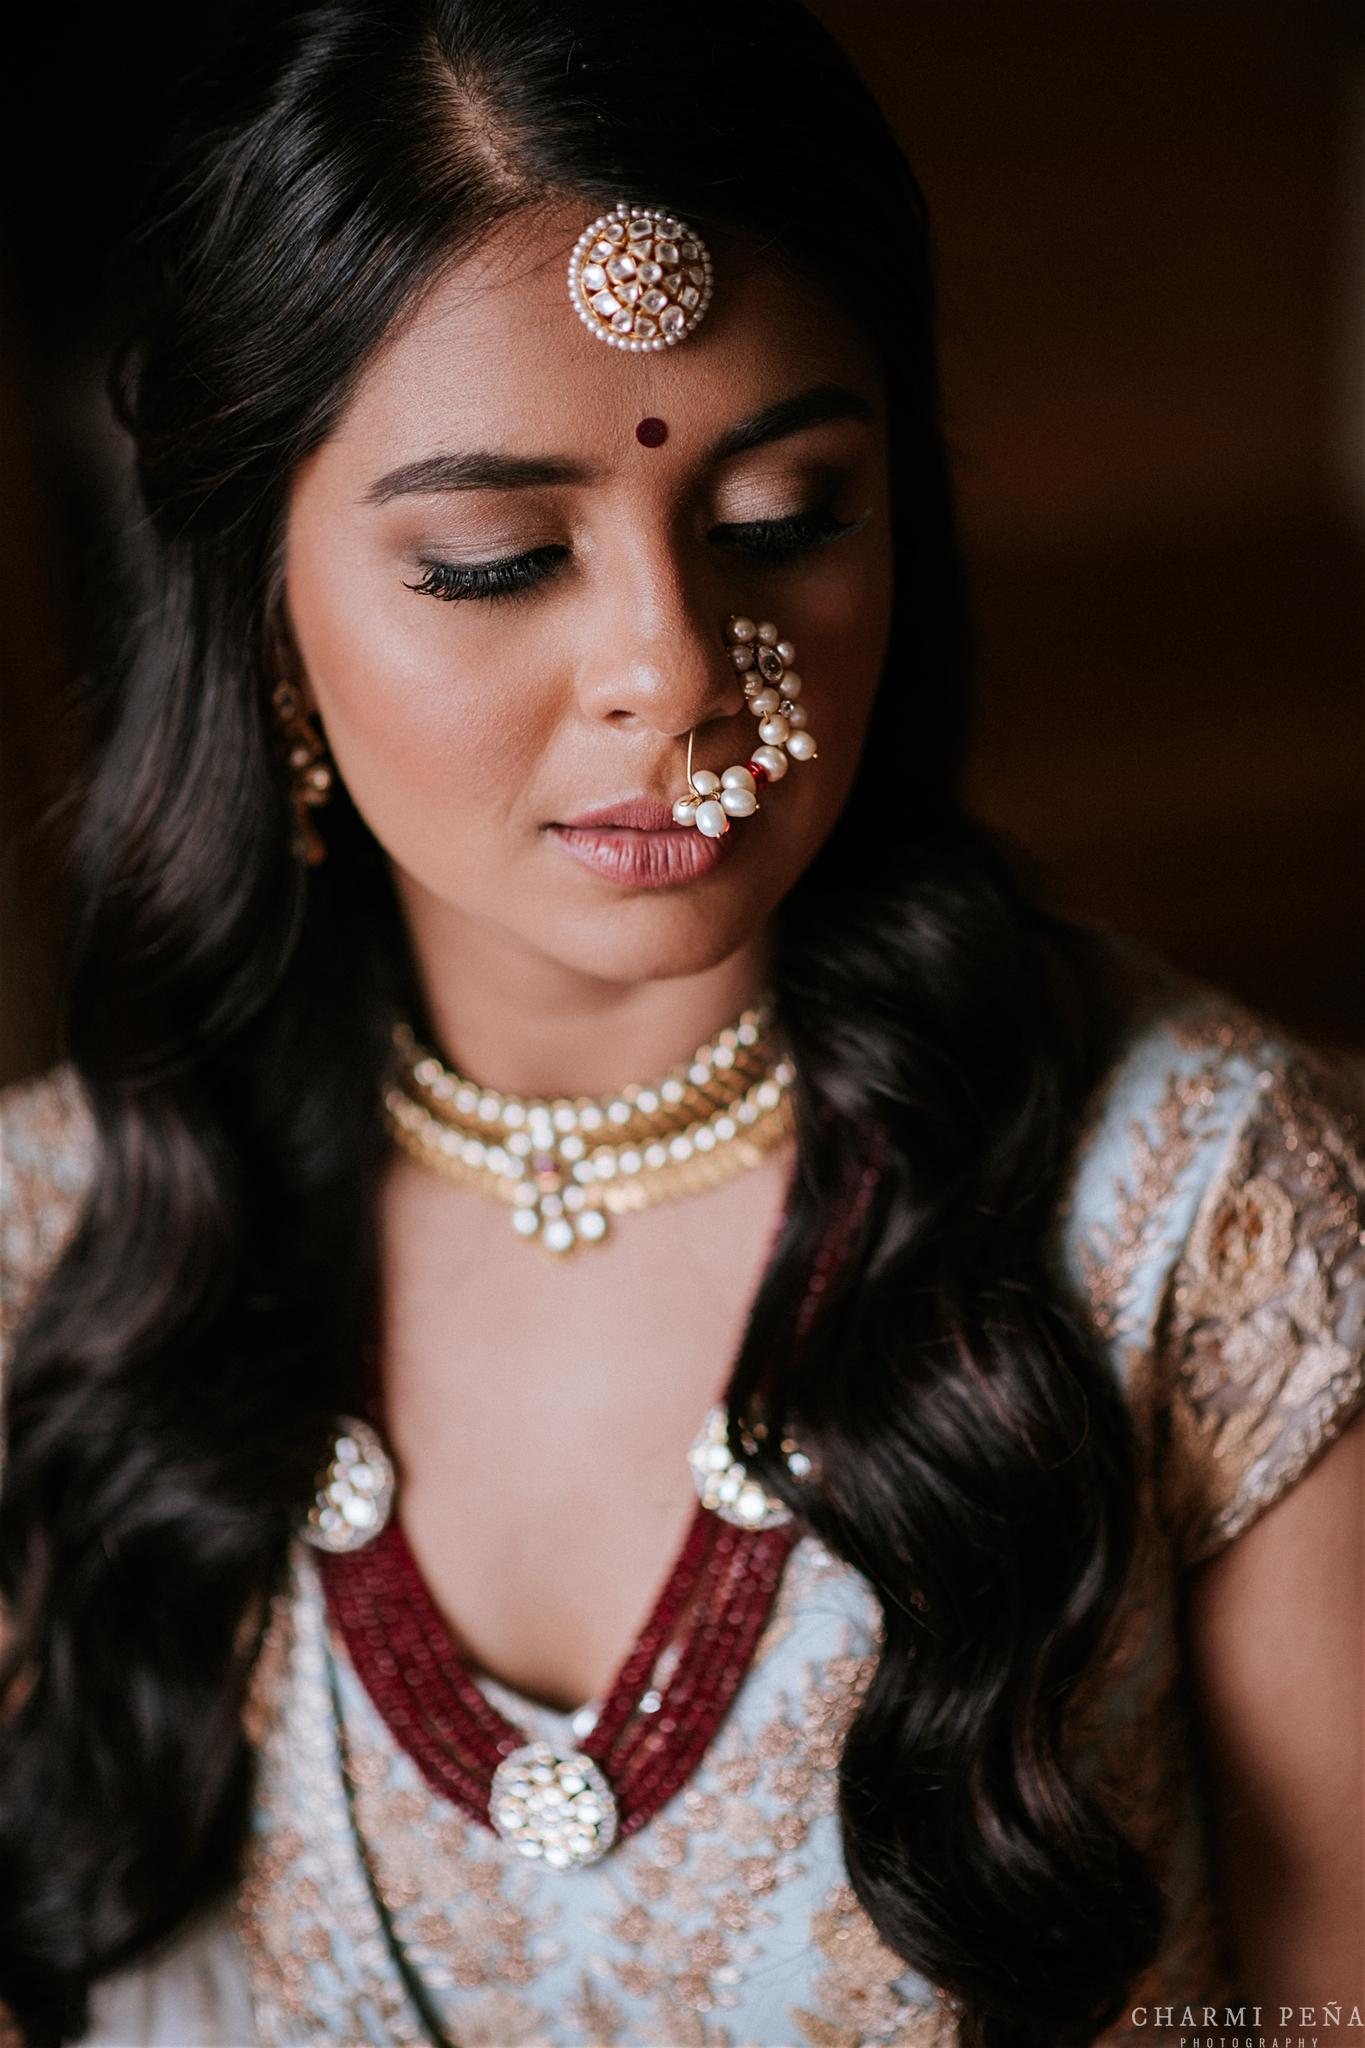 INDIAN WEDDING BRIDE CLOSEUP2.jpg